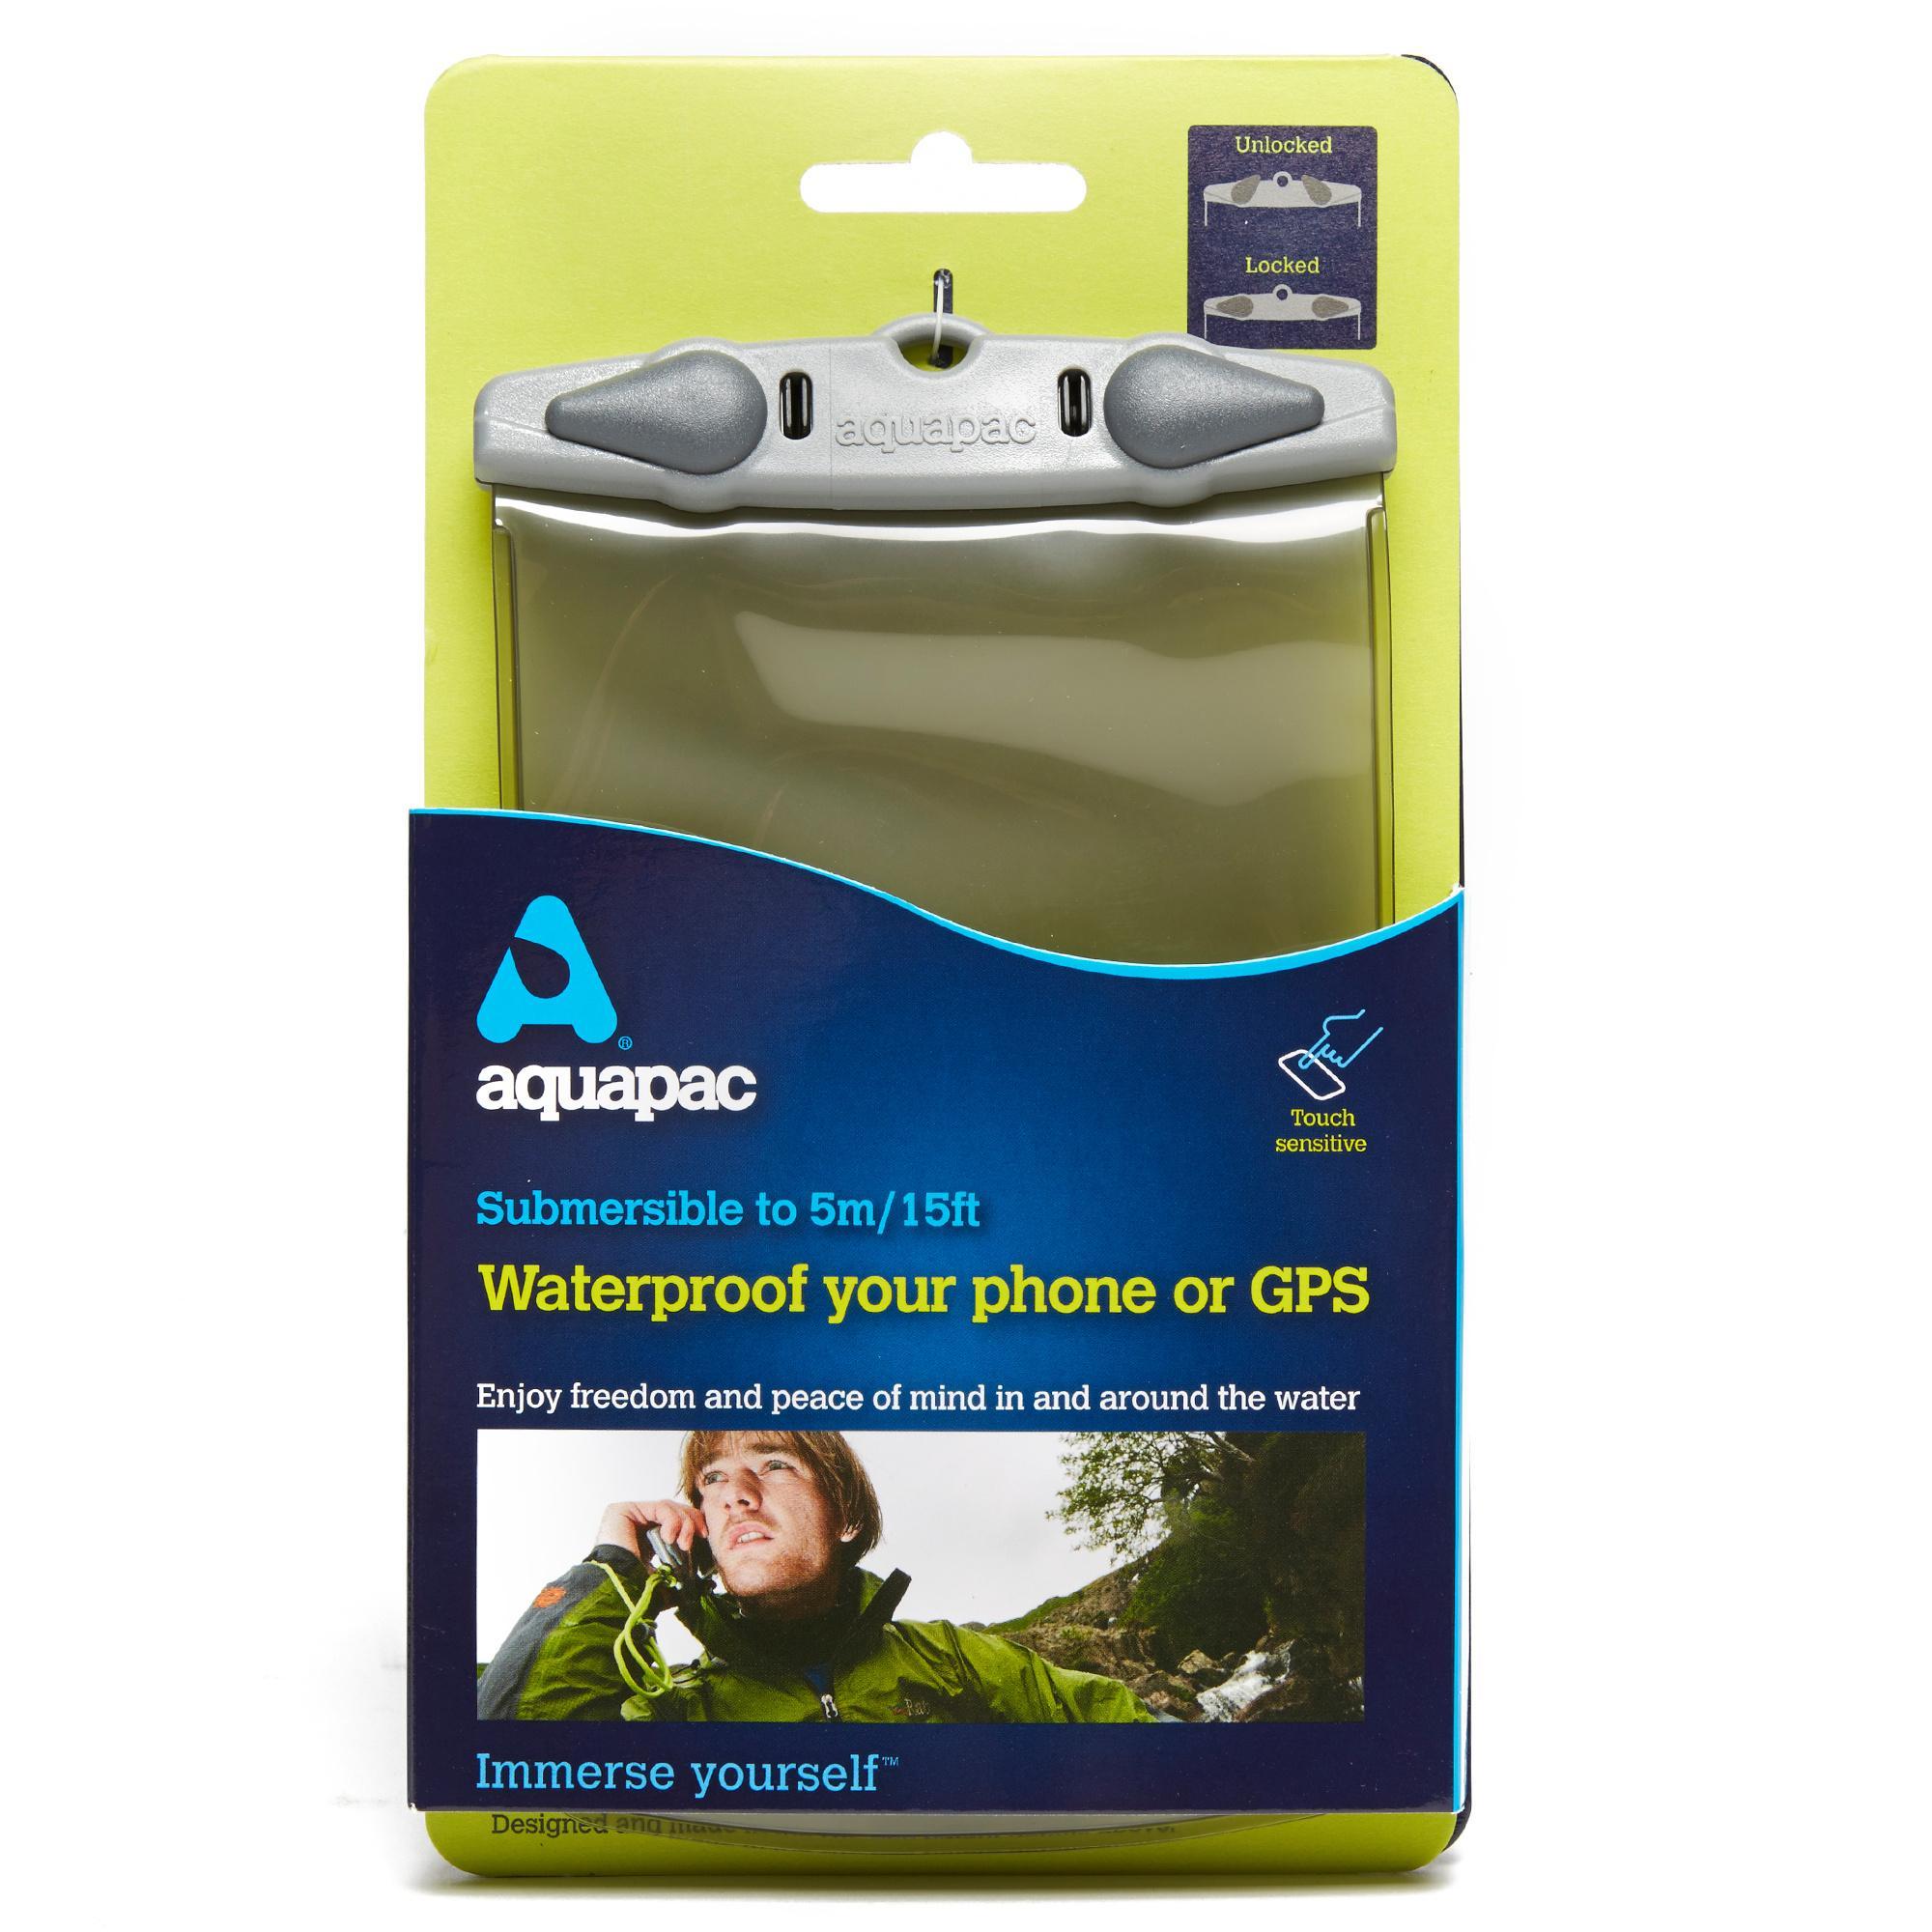 Aquapac Small Whanganui Waterproof Phone Case, Assorted